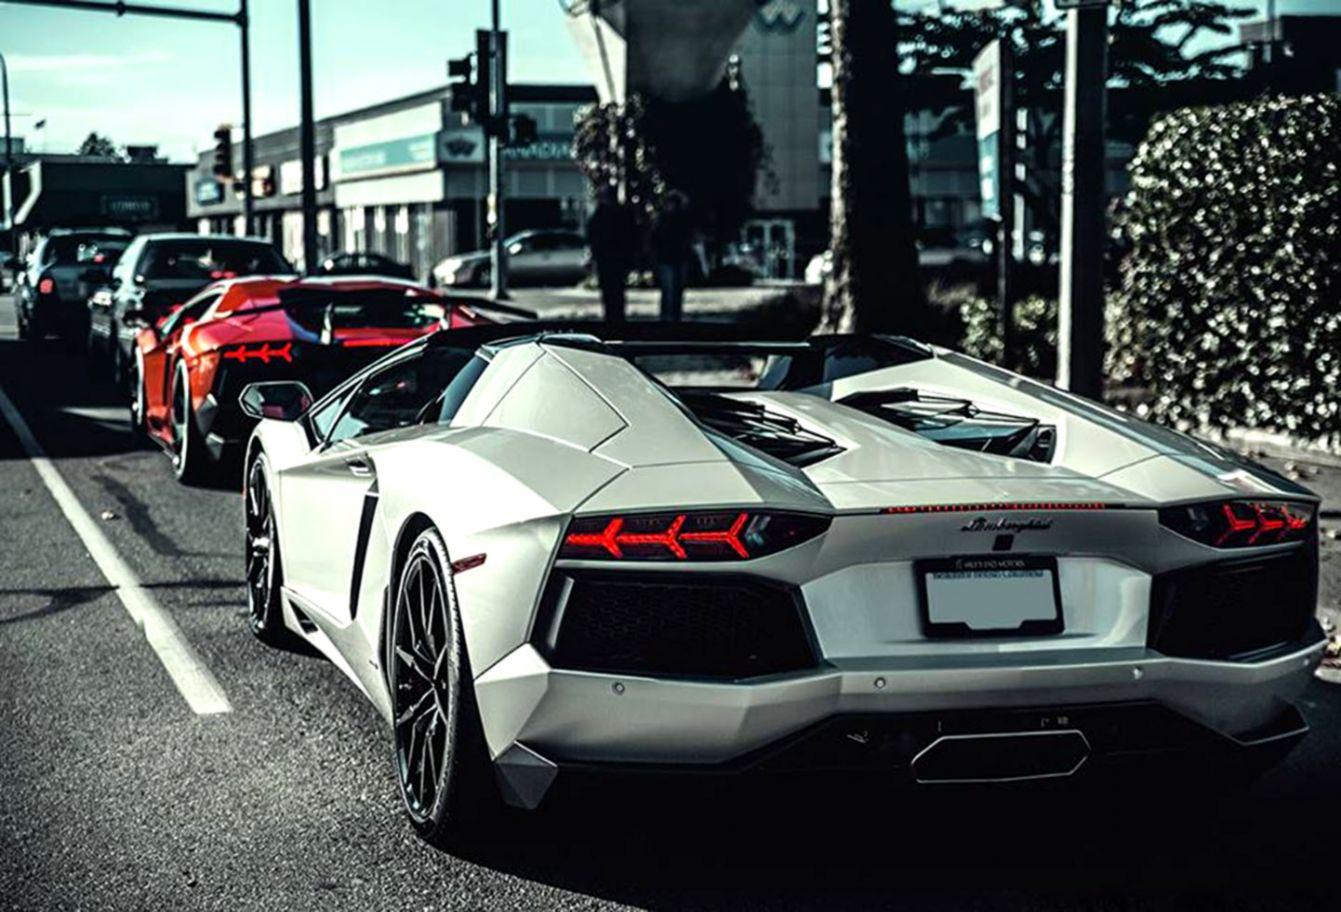 Lamborghini Aventador Red And White Wallpaper Desktop